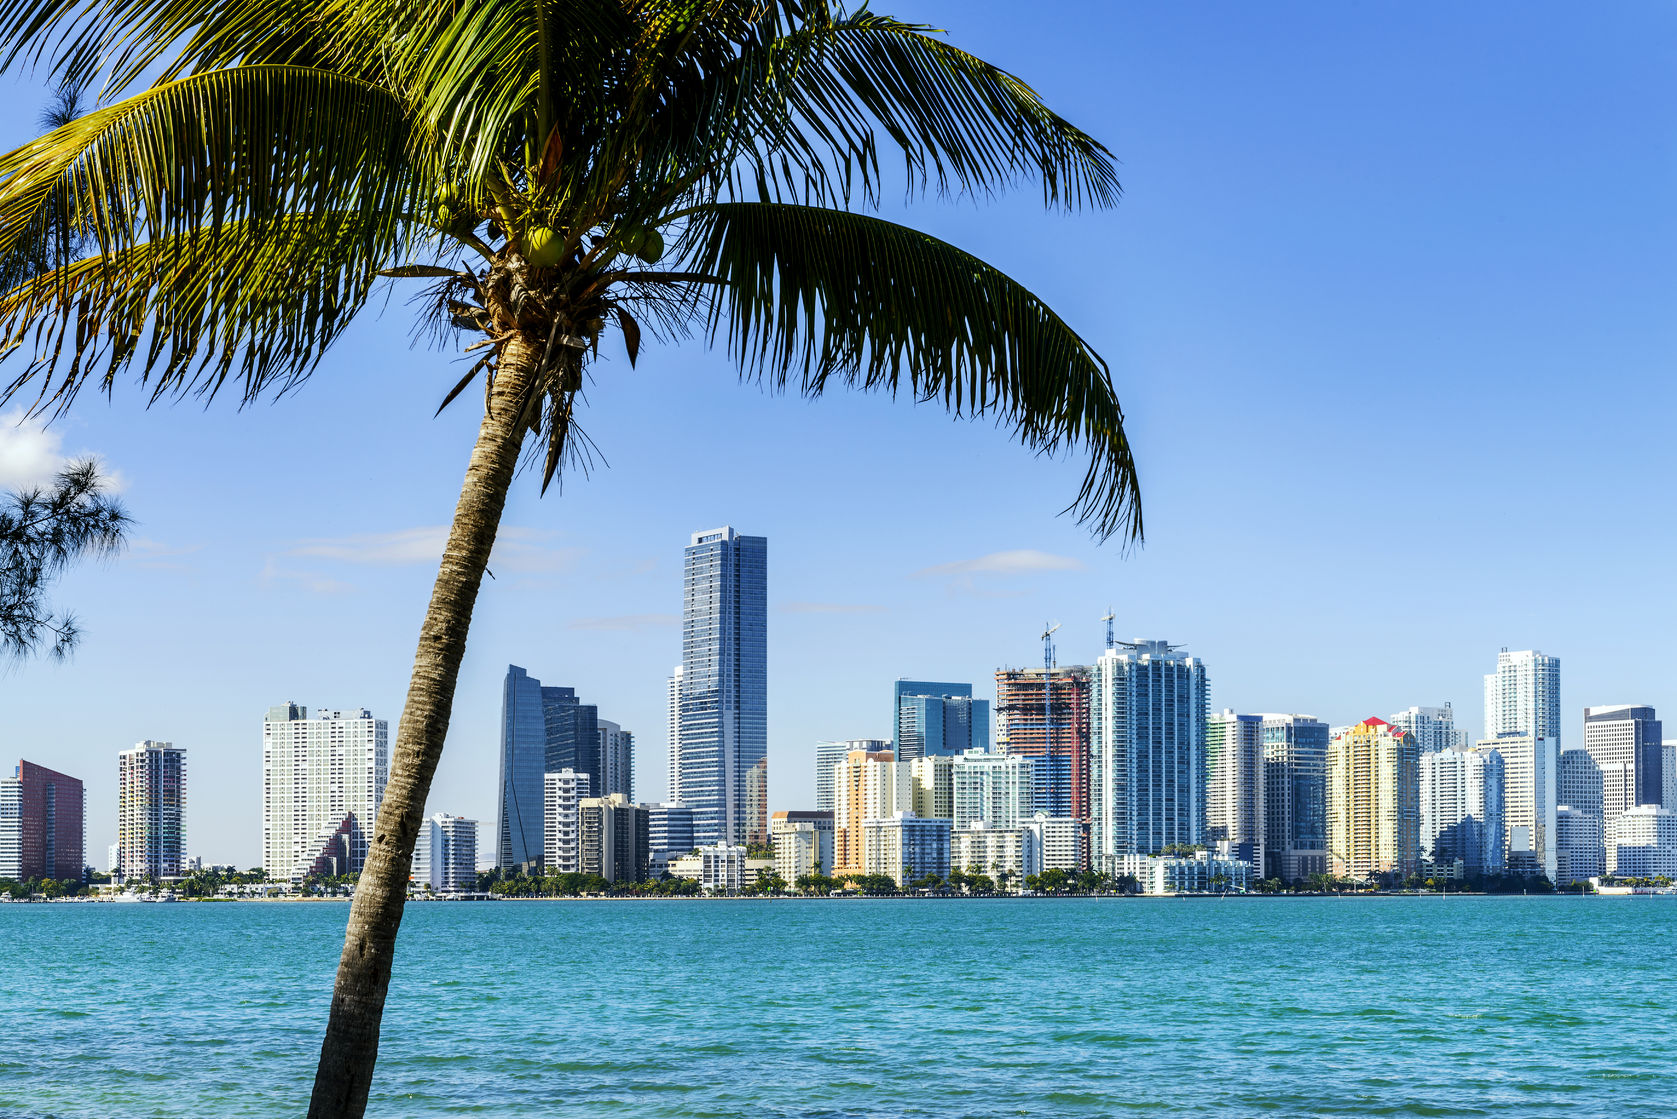 Miami_collage_20110330.jpg